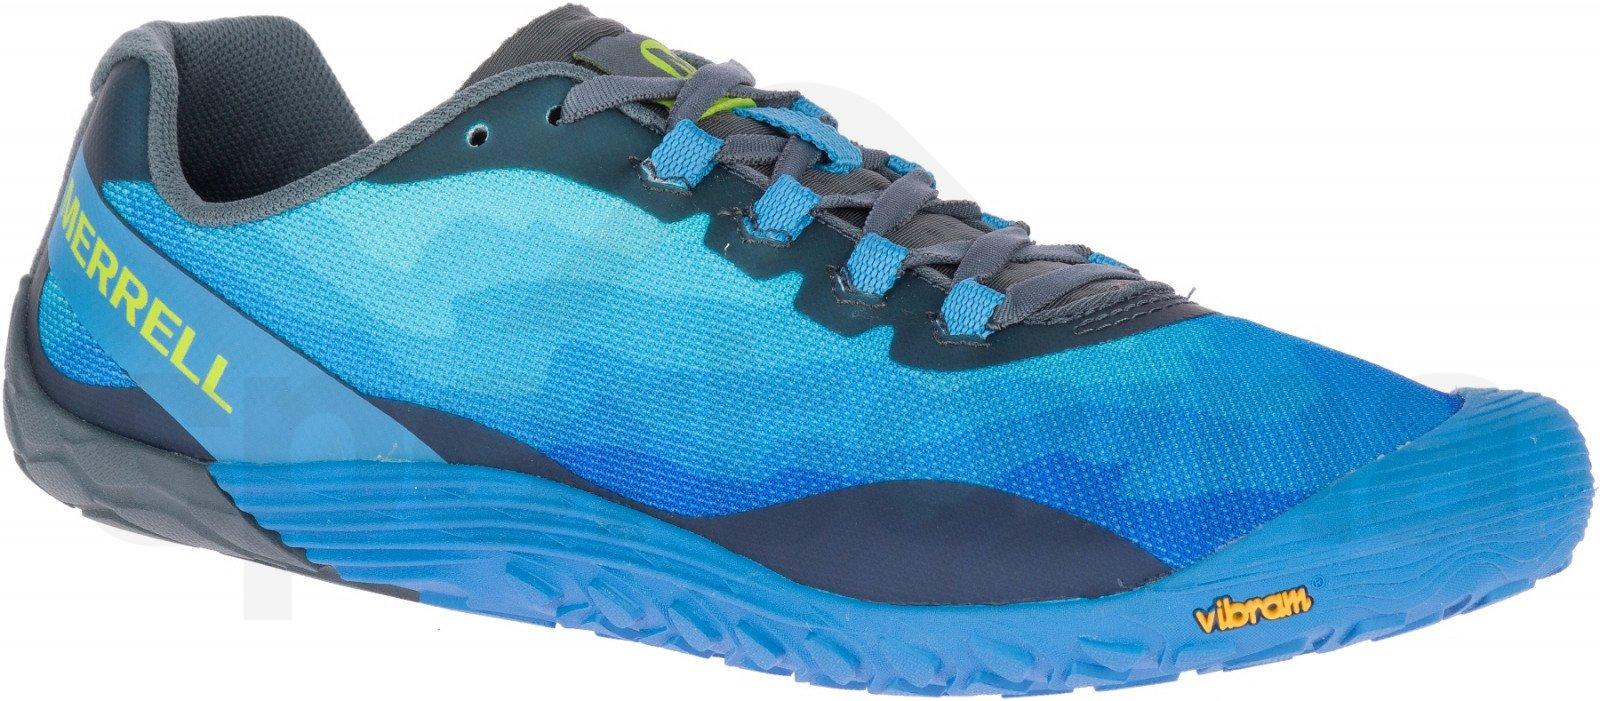 1b6af3f0-panske-boty-merrell-vapor-glove-4-modra-mediterranian-blue